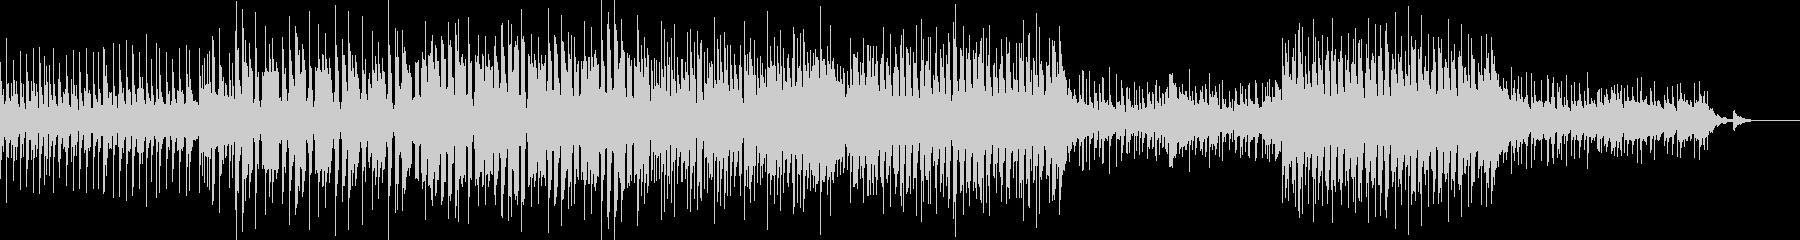 ★kawaiiフューチャーベースPOP3の未再生の波形